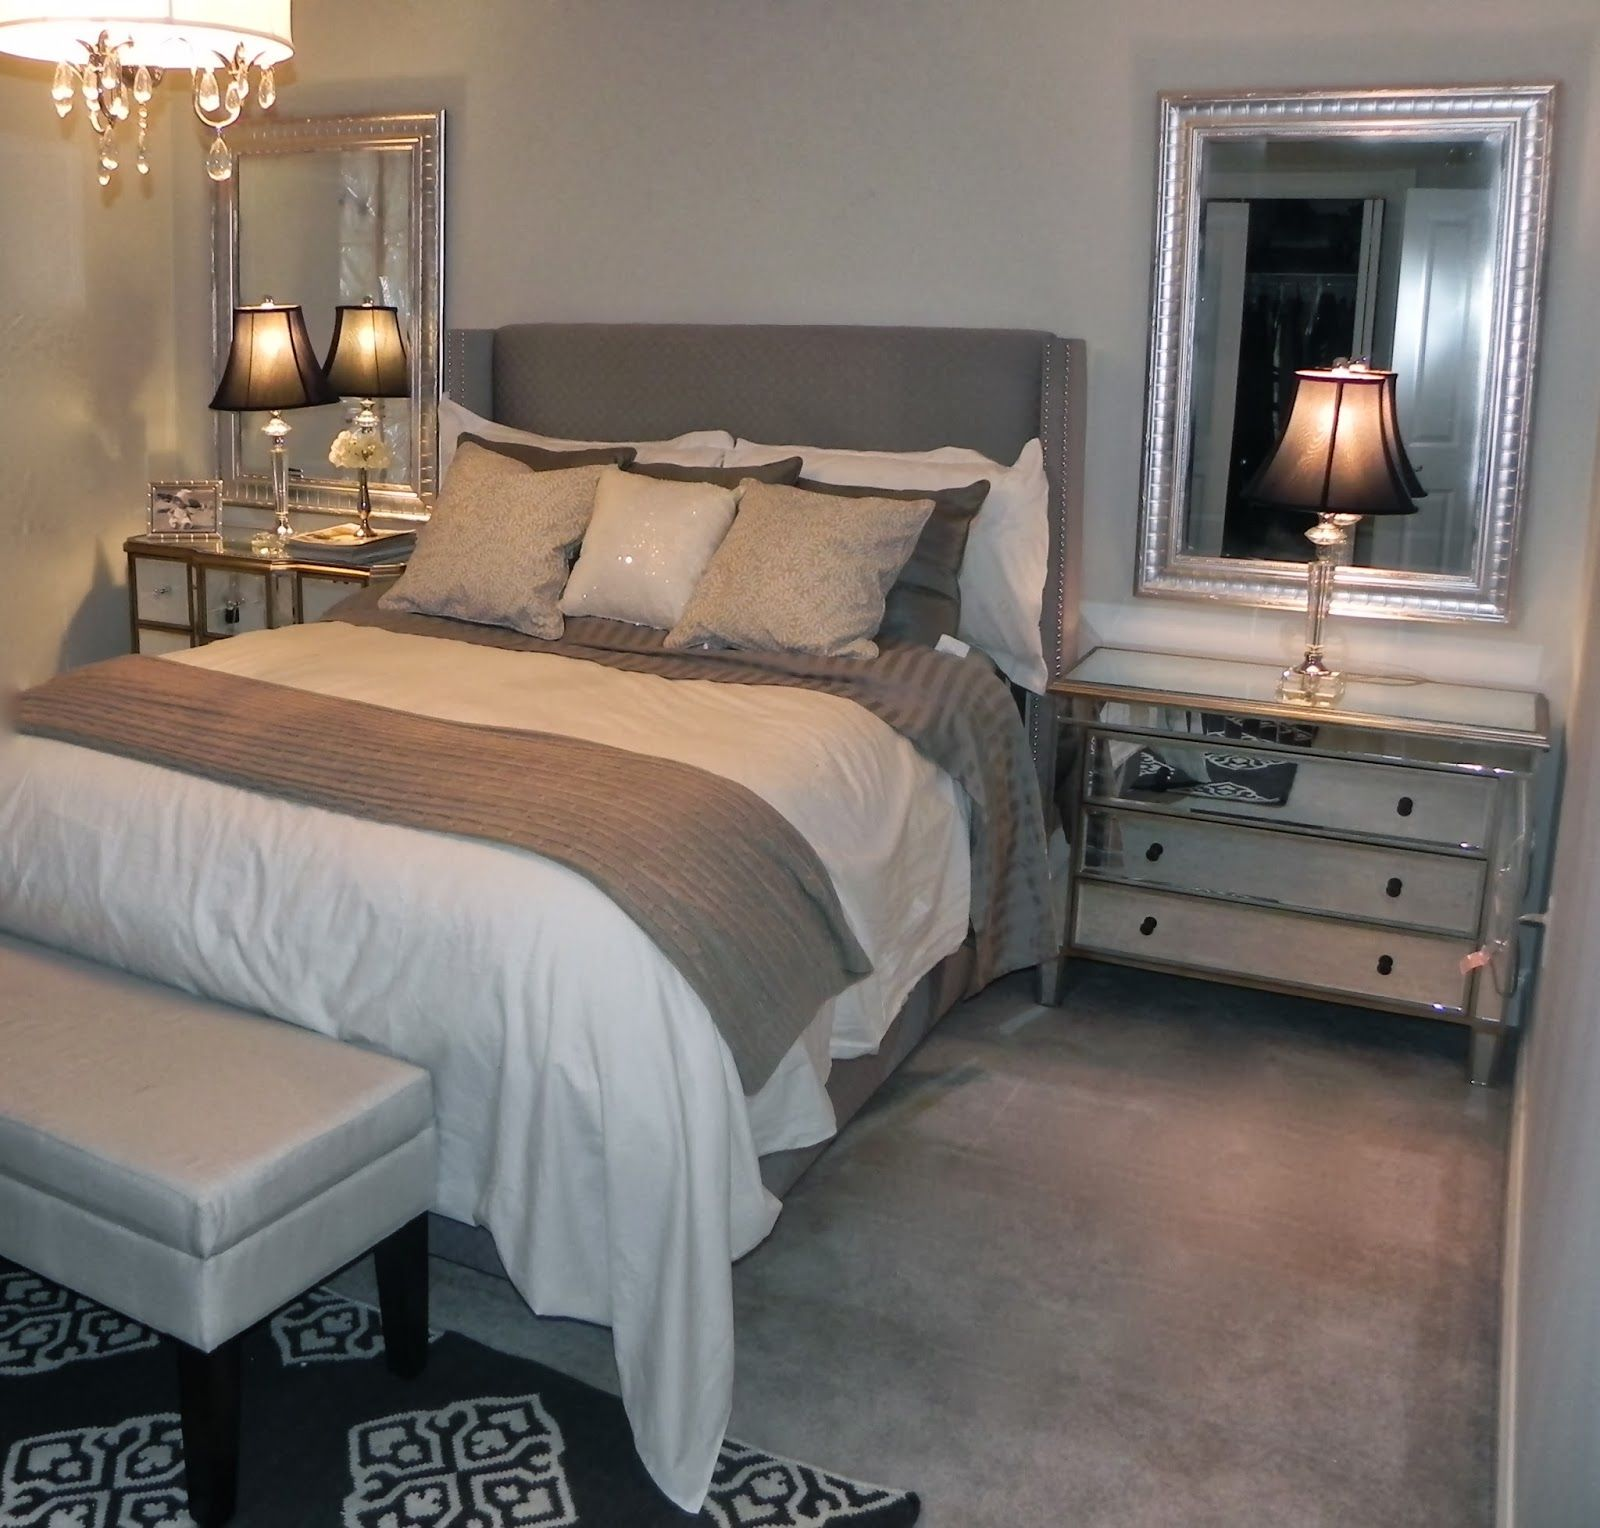 dscn3171 jpg 1 600 1 528 pixels beige bedroom remodel on discover ideas about master dream bedroom id=34521